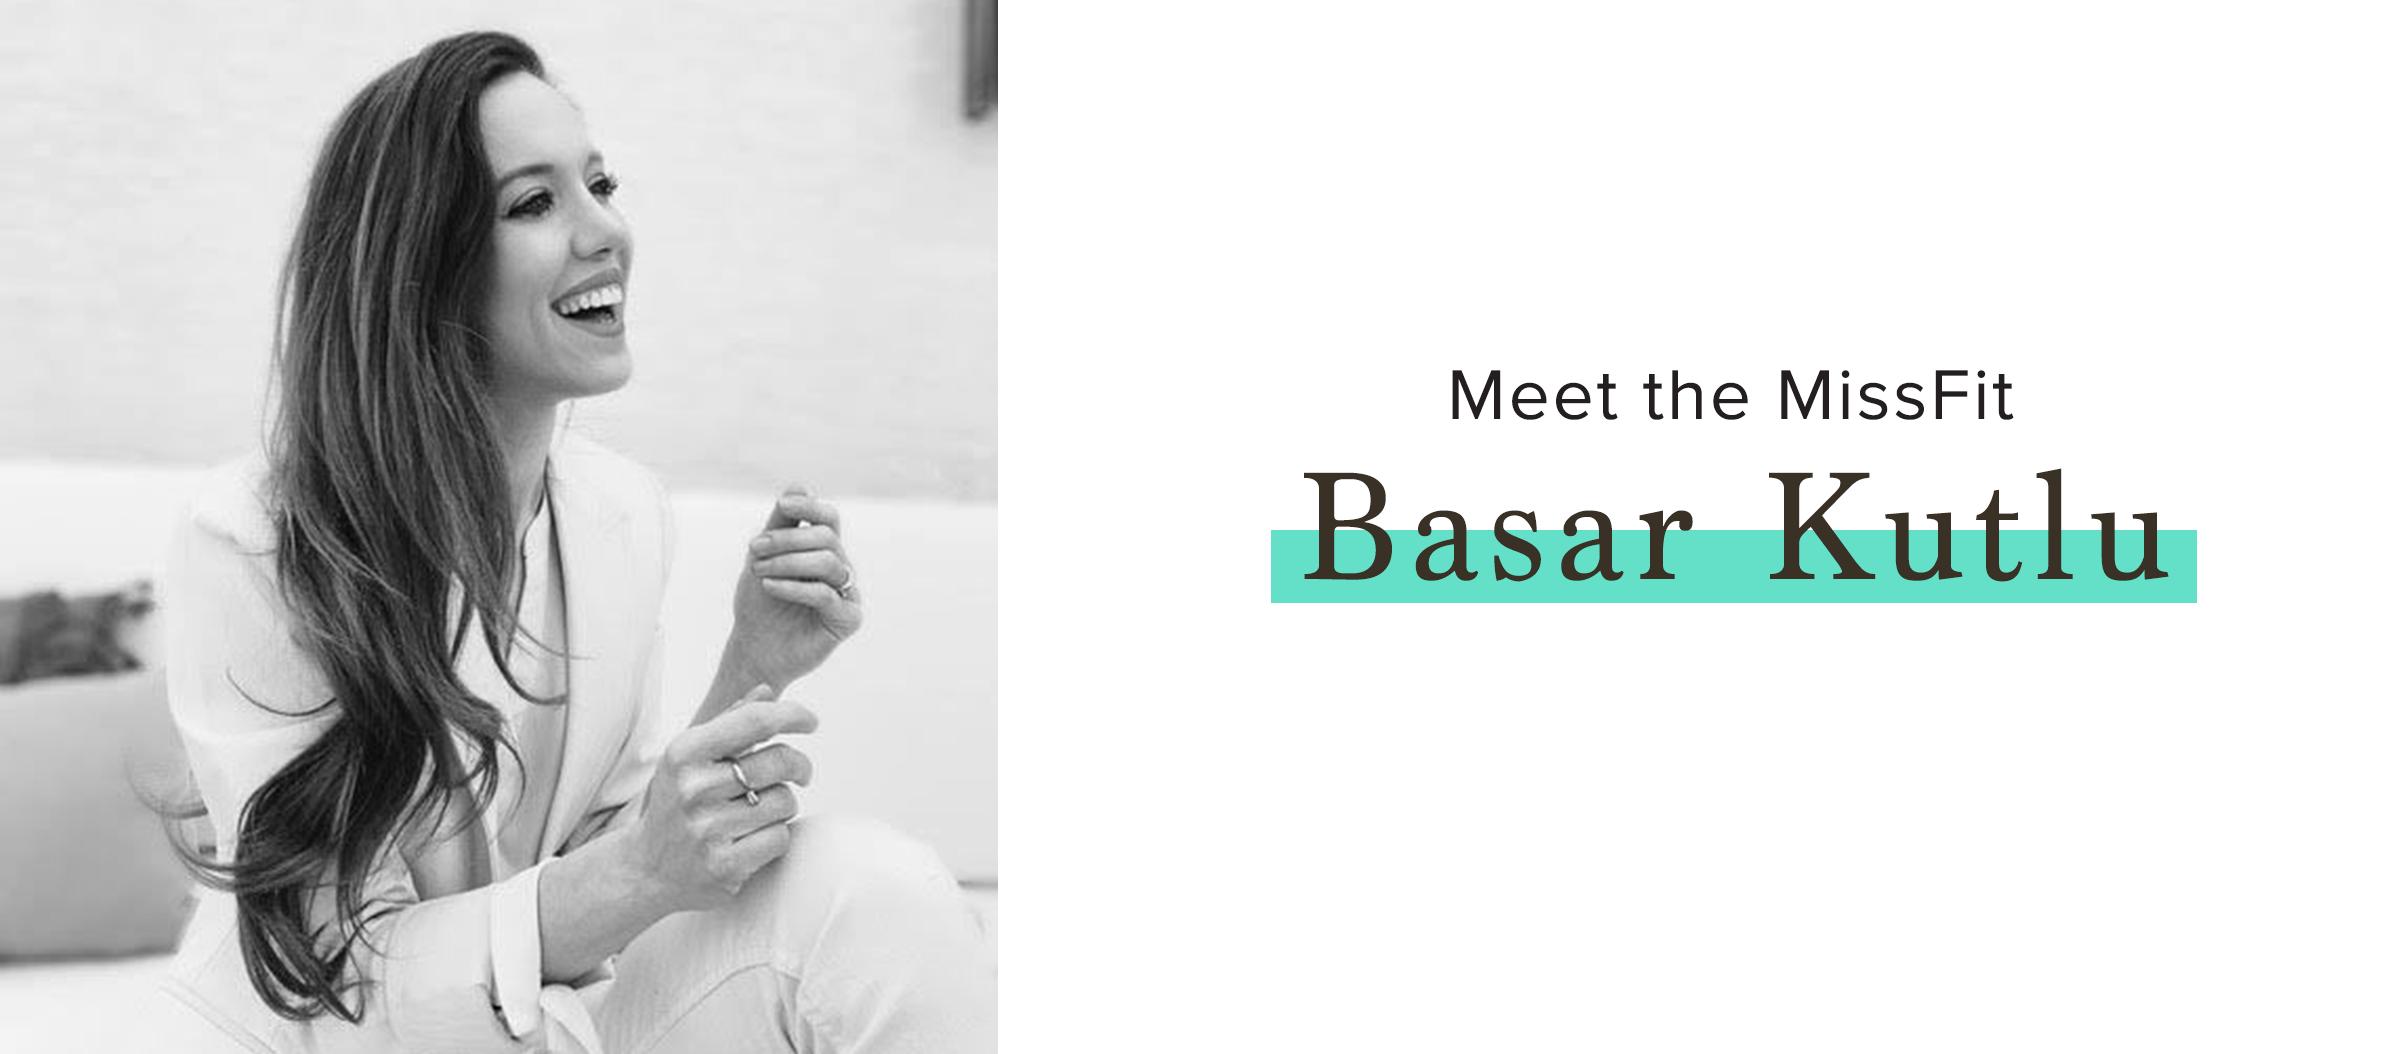 Meet the MissFit, Basar Kutlu